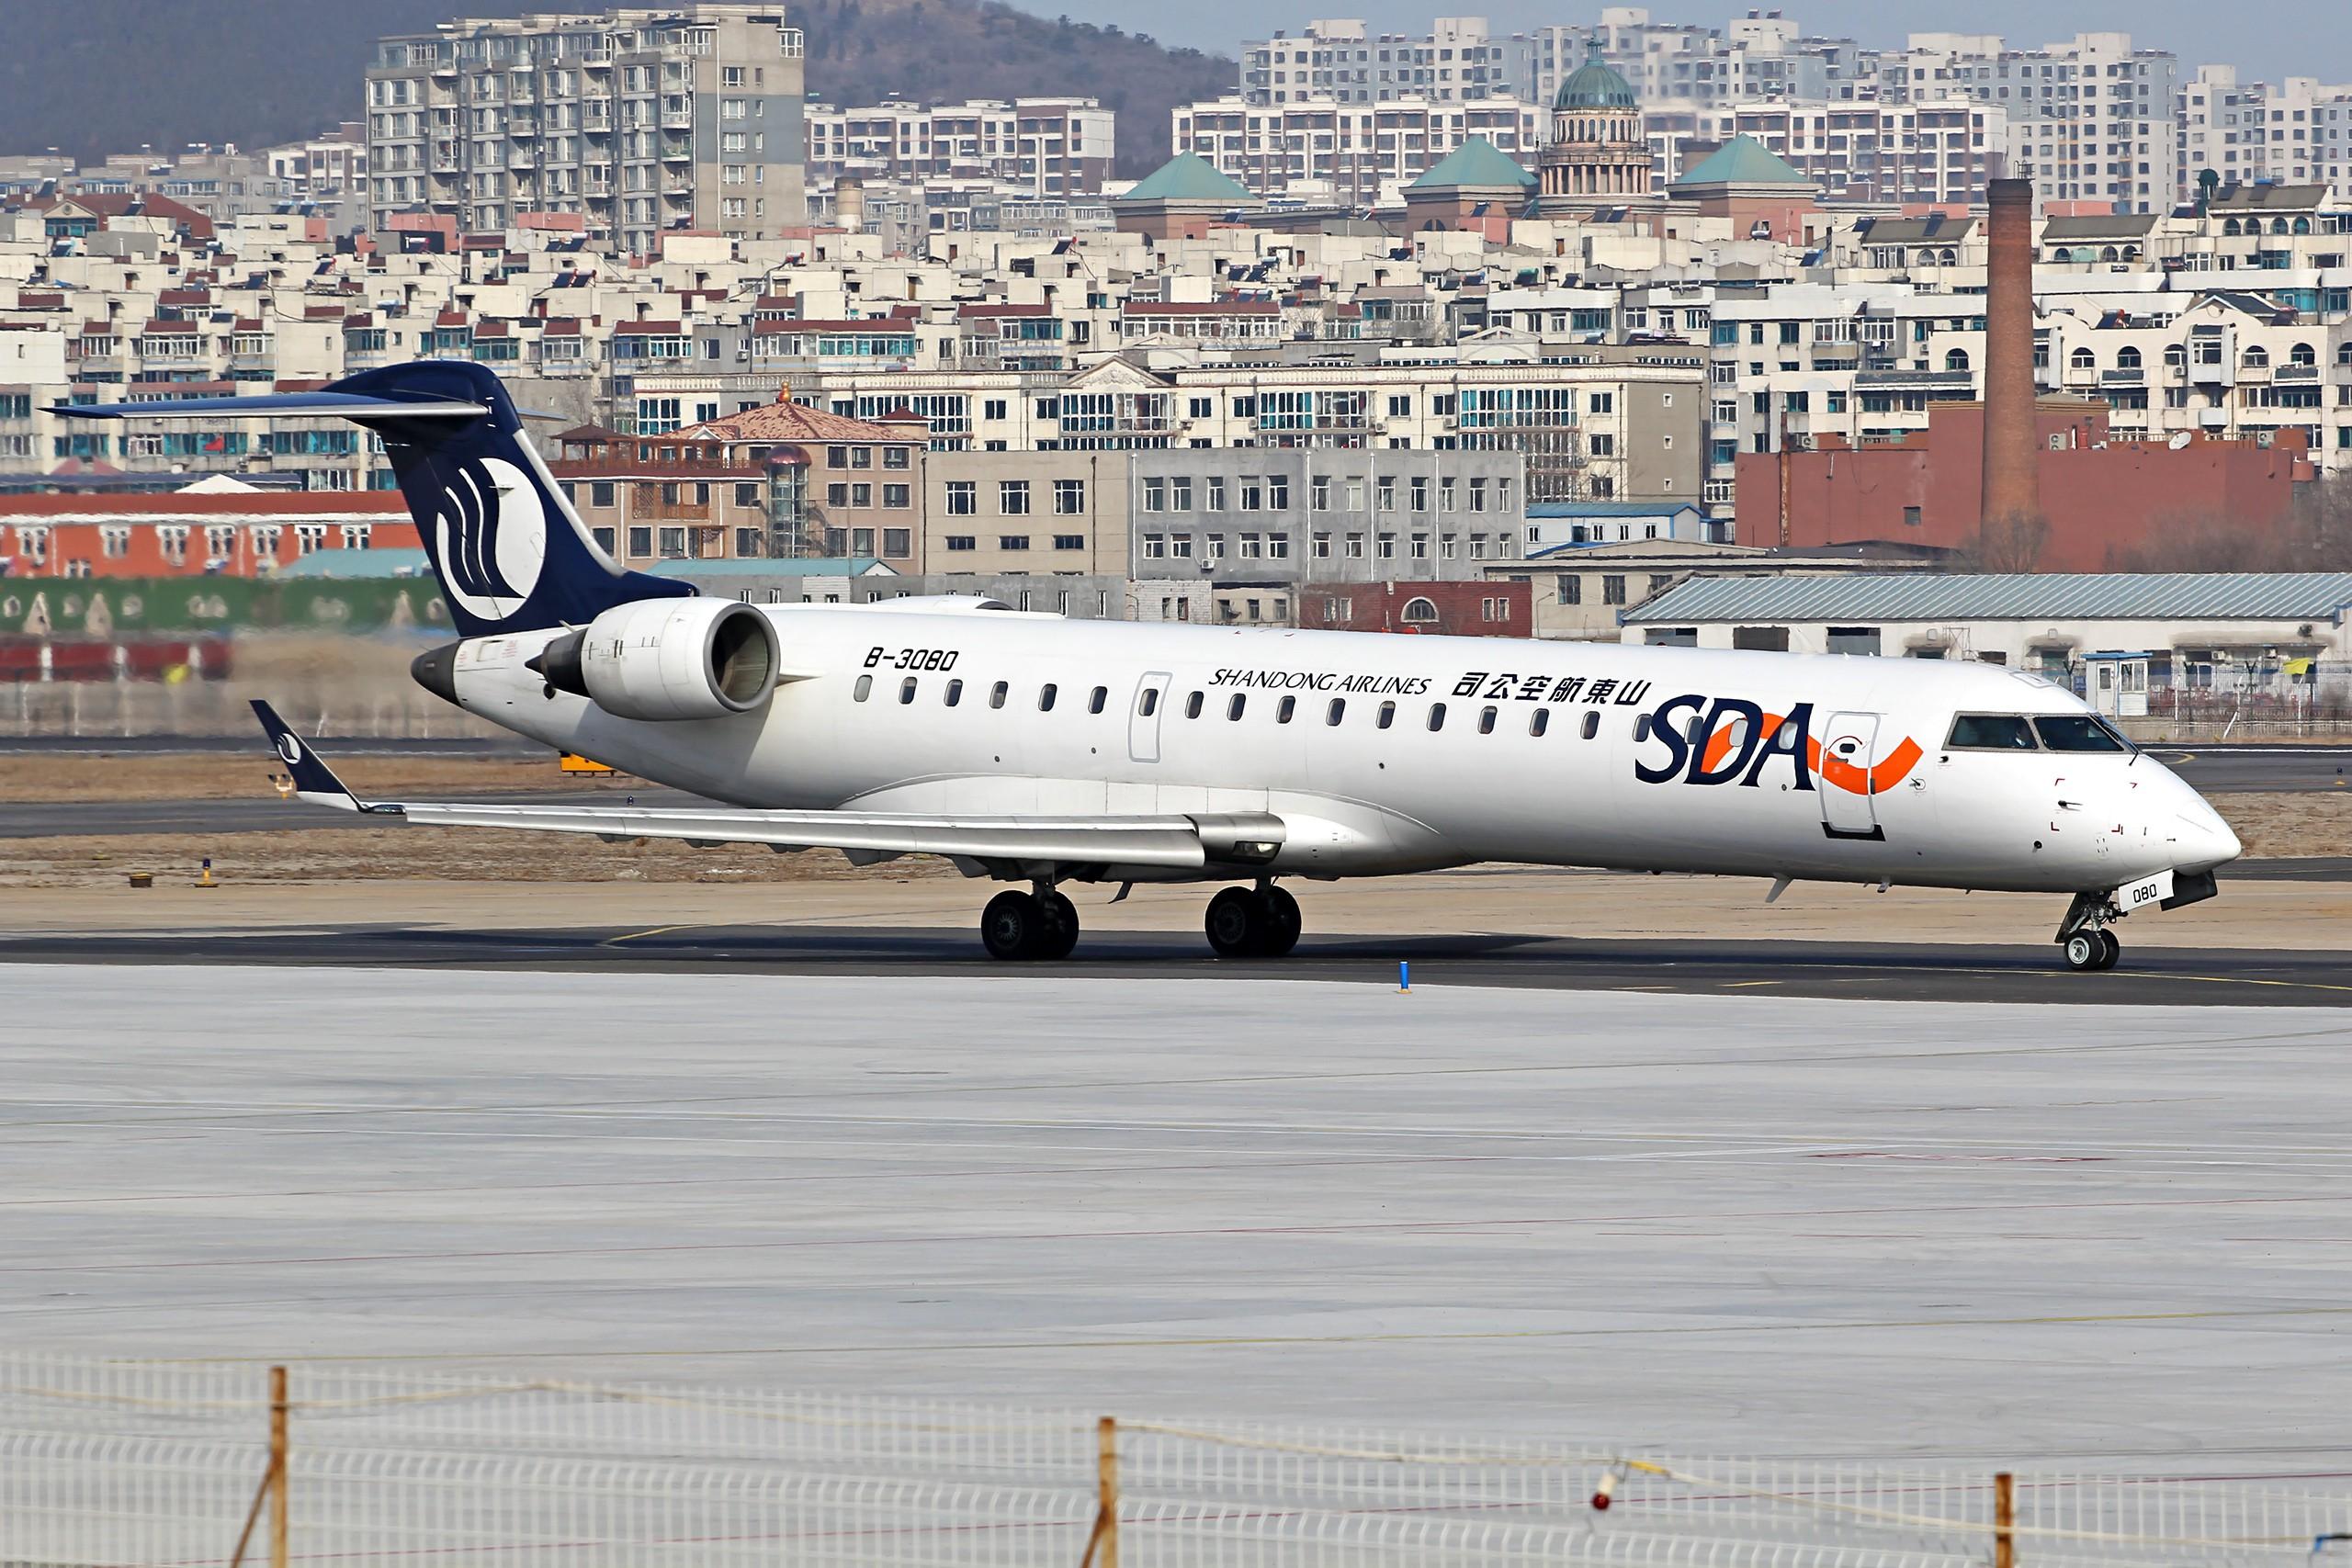 Re:[原创][DLC]...窄体机...2560x1707}Pix BOMBARDIER CRJ-700 B-3080 中国大连周水子国际机场